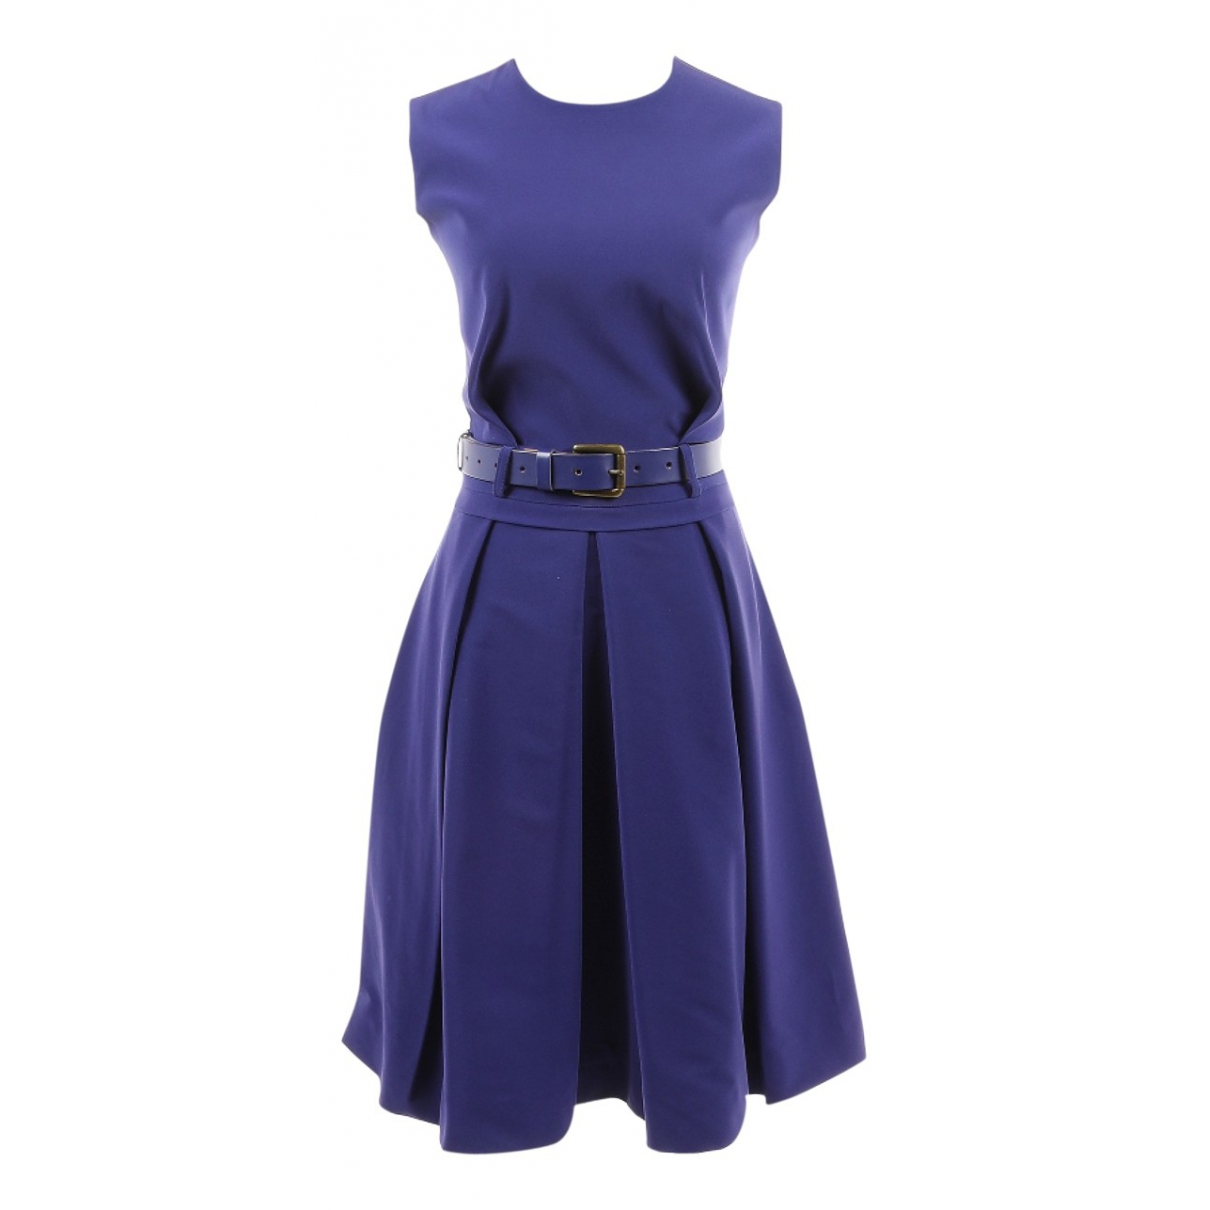 Preen By Thornton Bregazzi \N Kleid in  Lila Synthetik